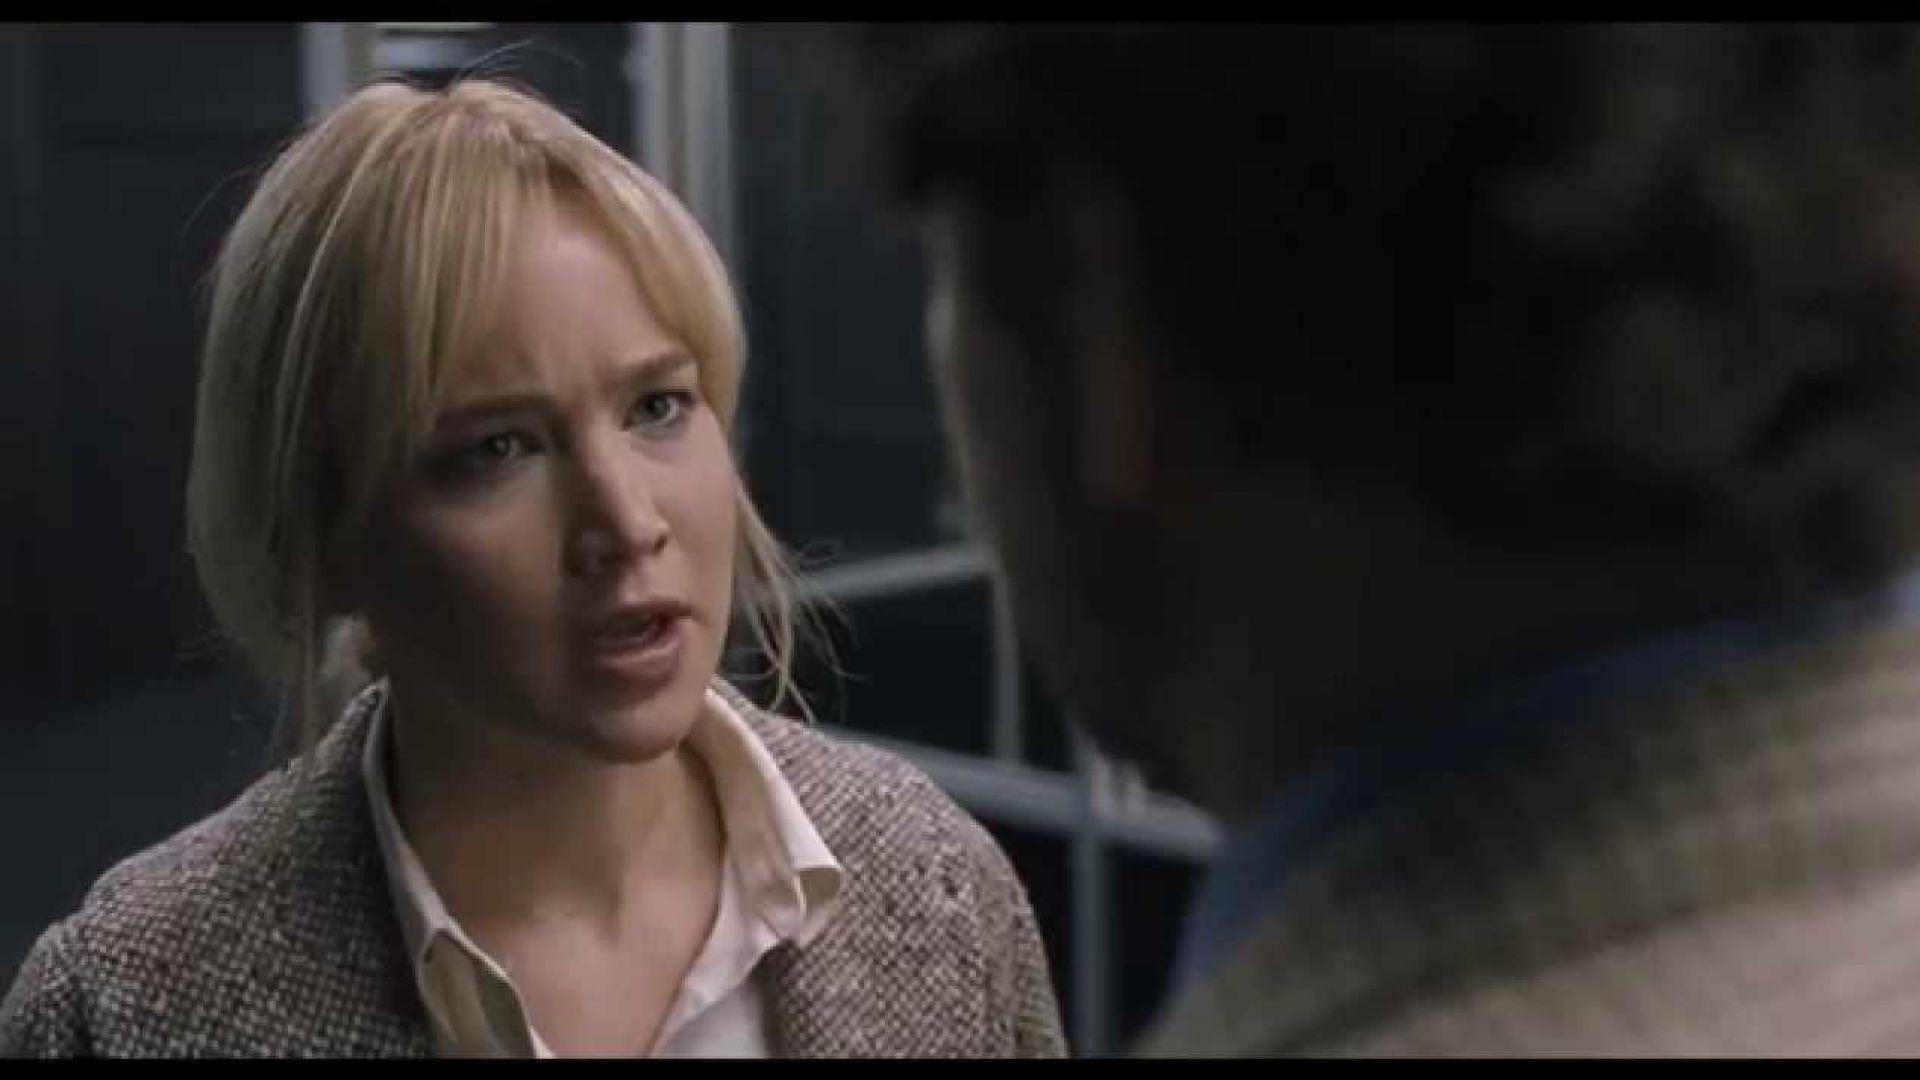 Official Clip for 'Joy' Starring Jennifer Lawrence